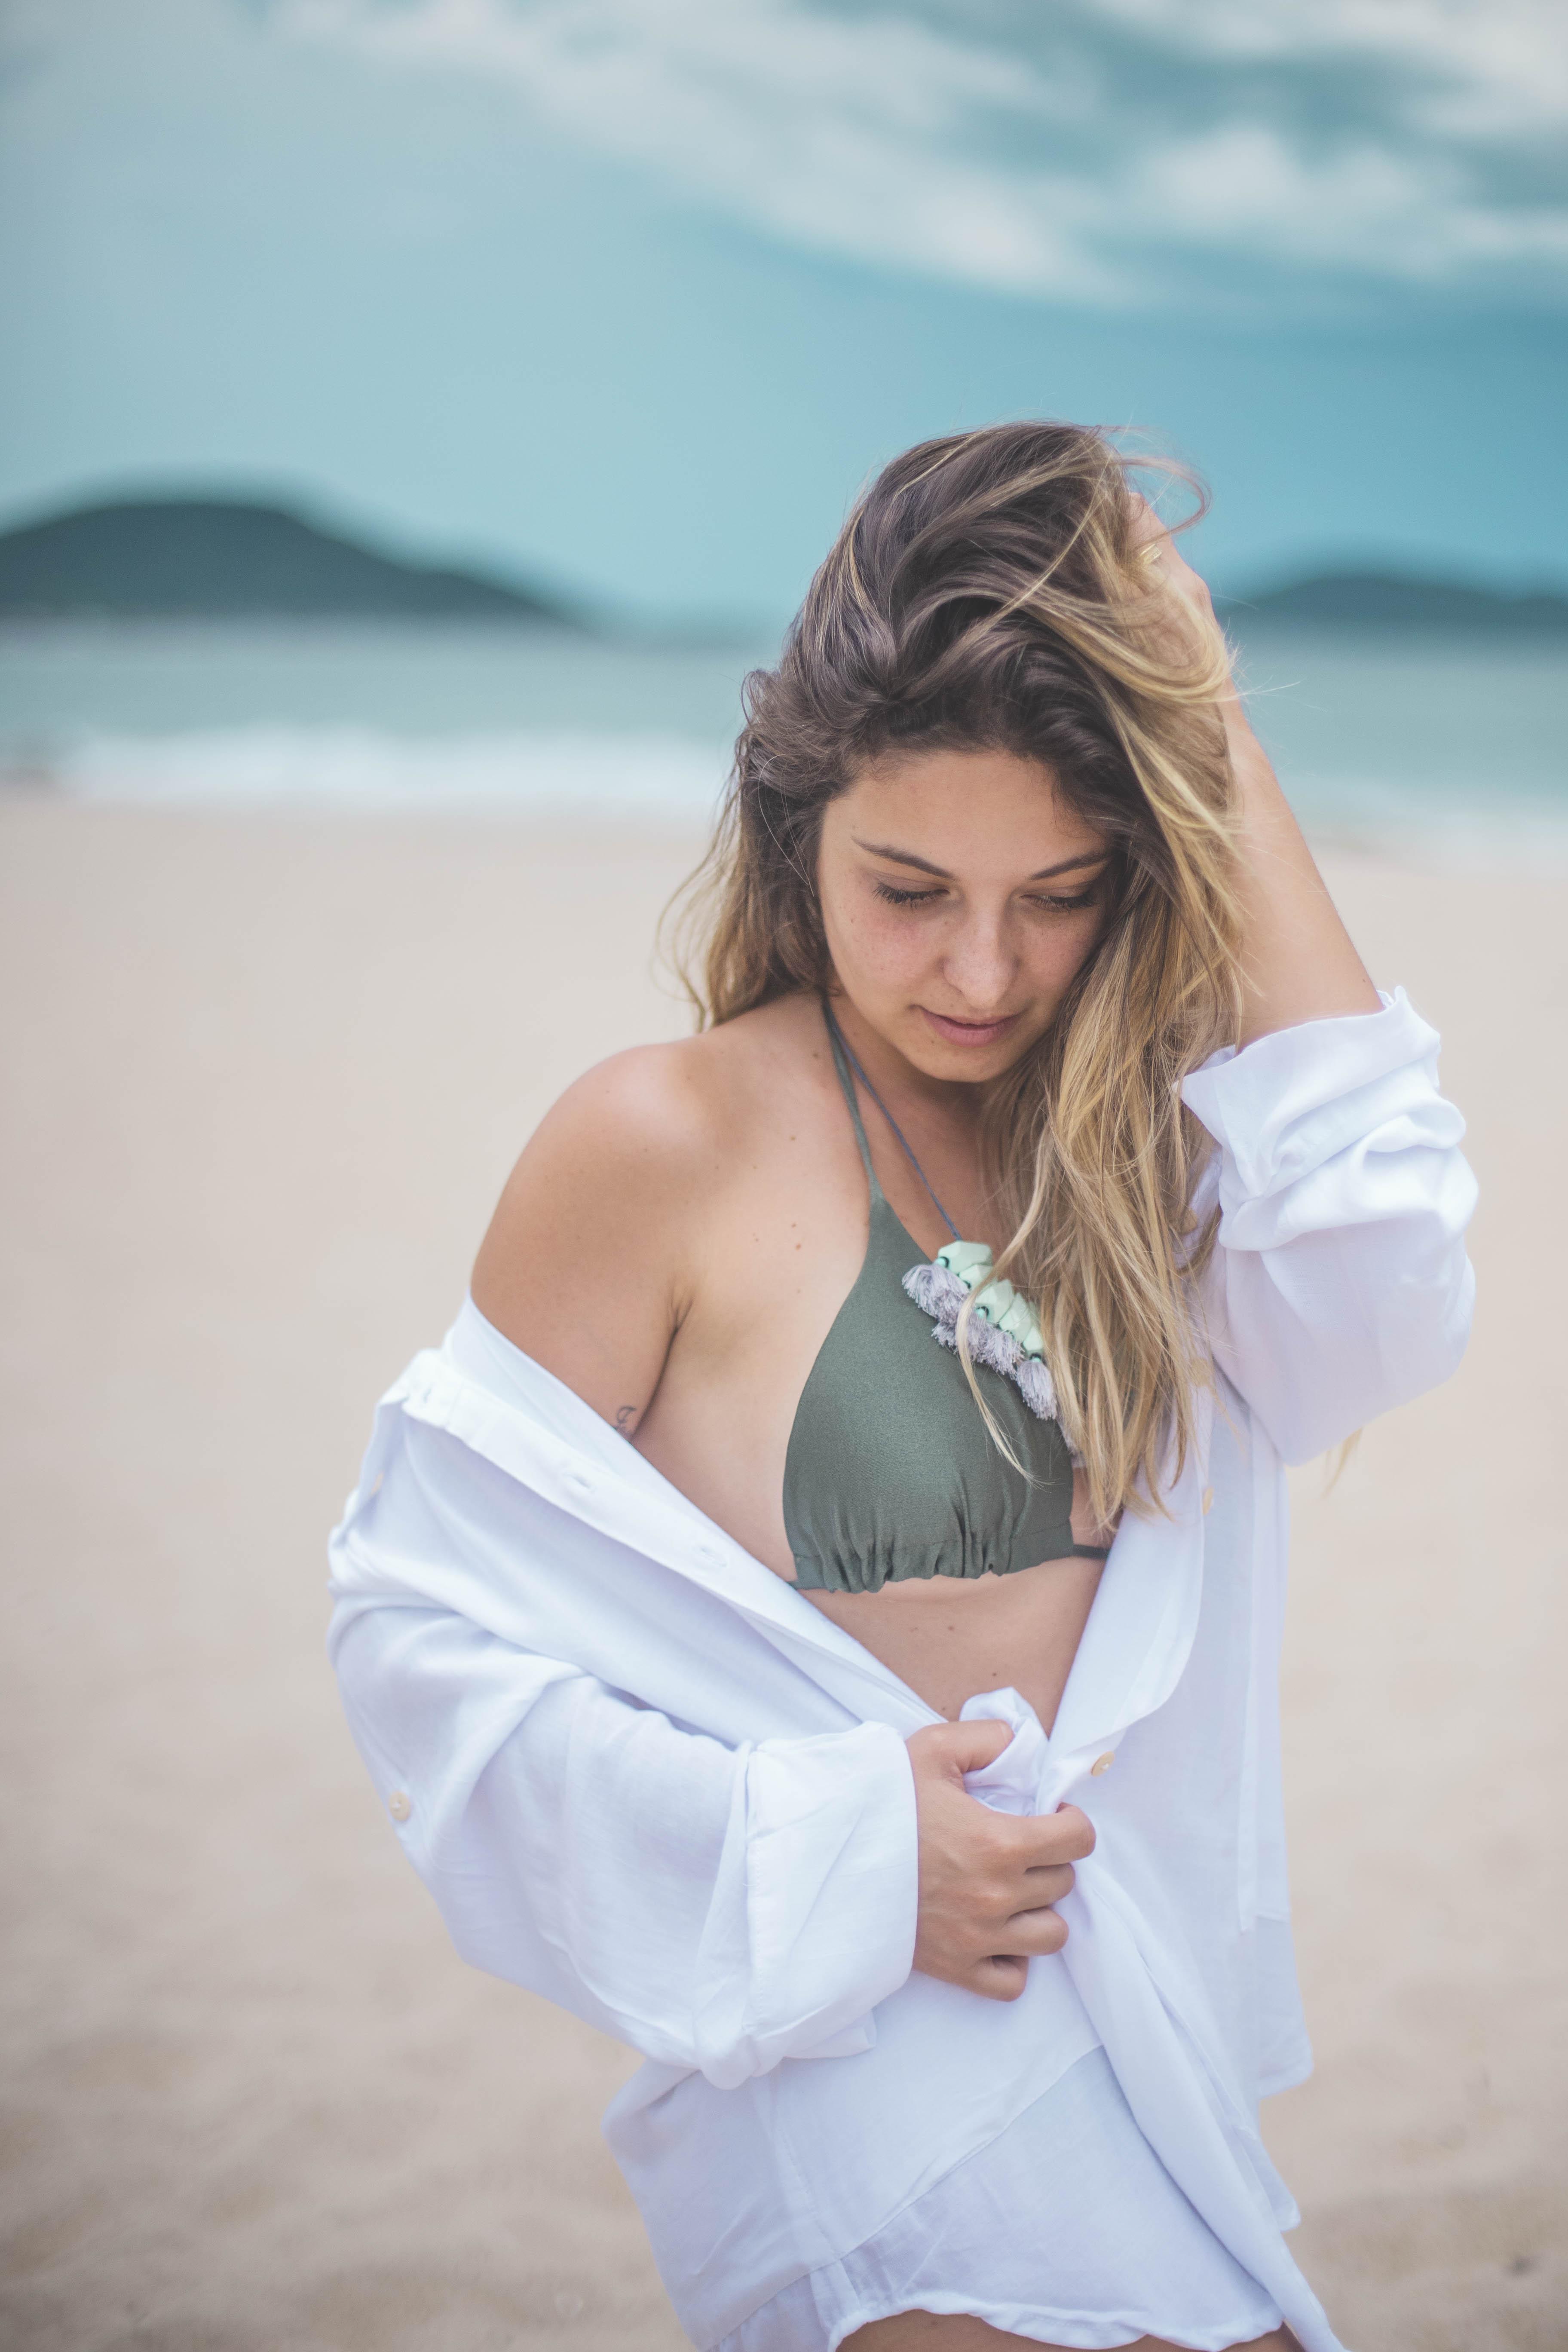 Gratuita Sobre Foto De Stock Hermosas BikiniBrasileñaChicas PXZiukwTO